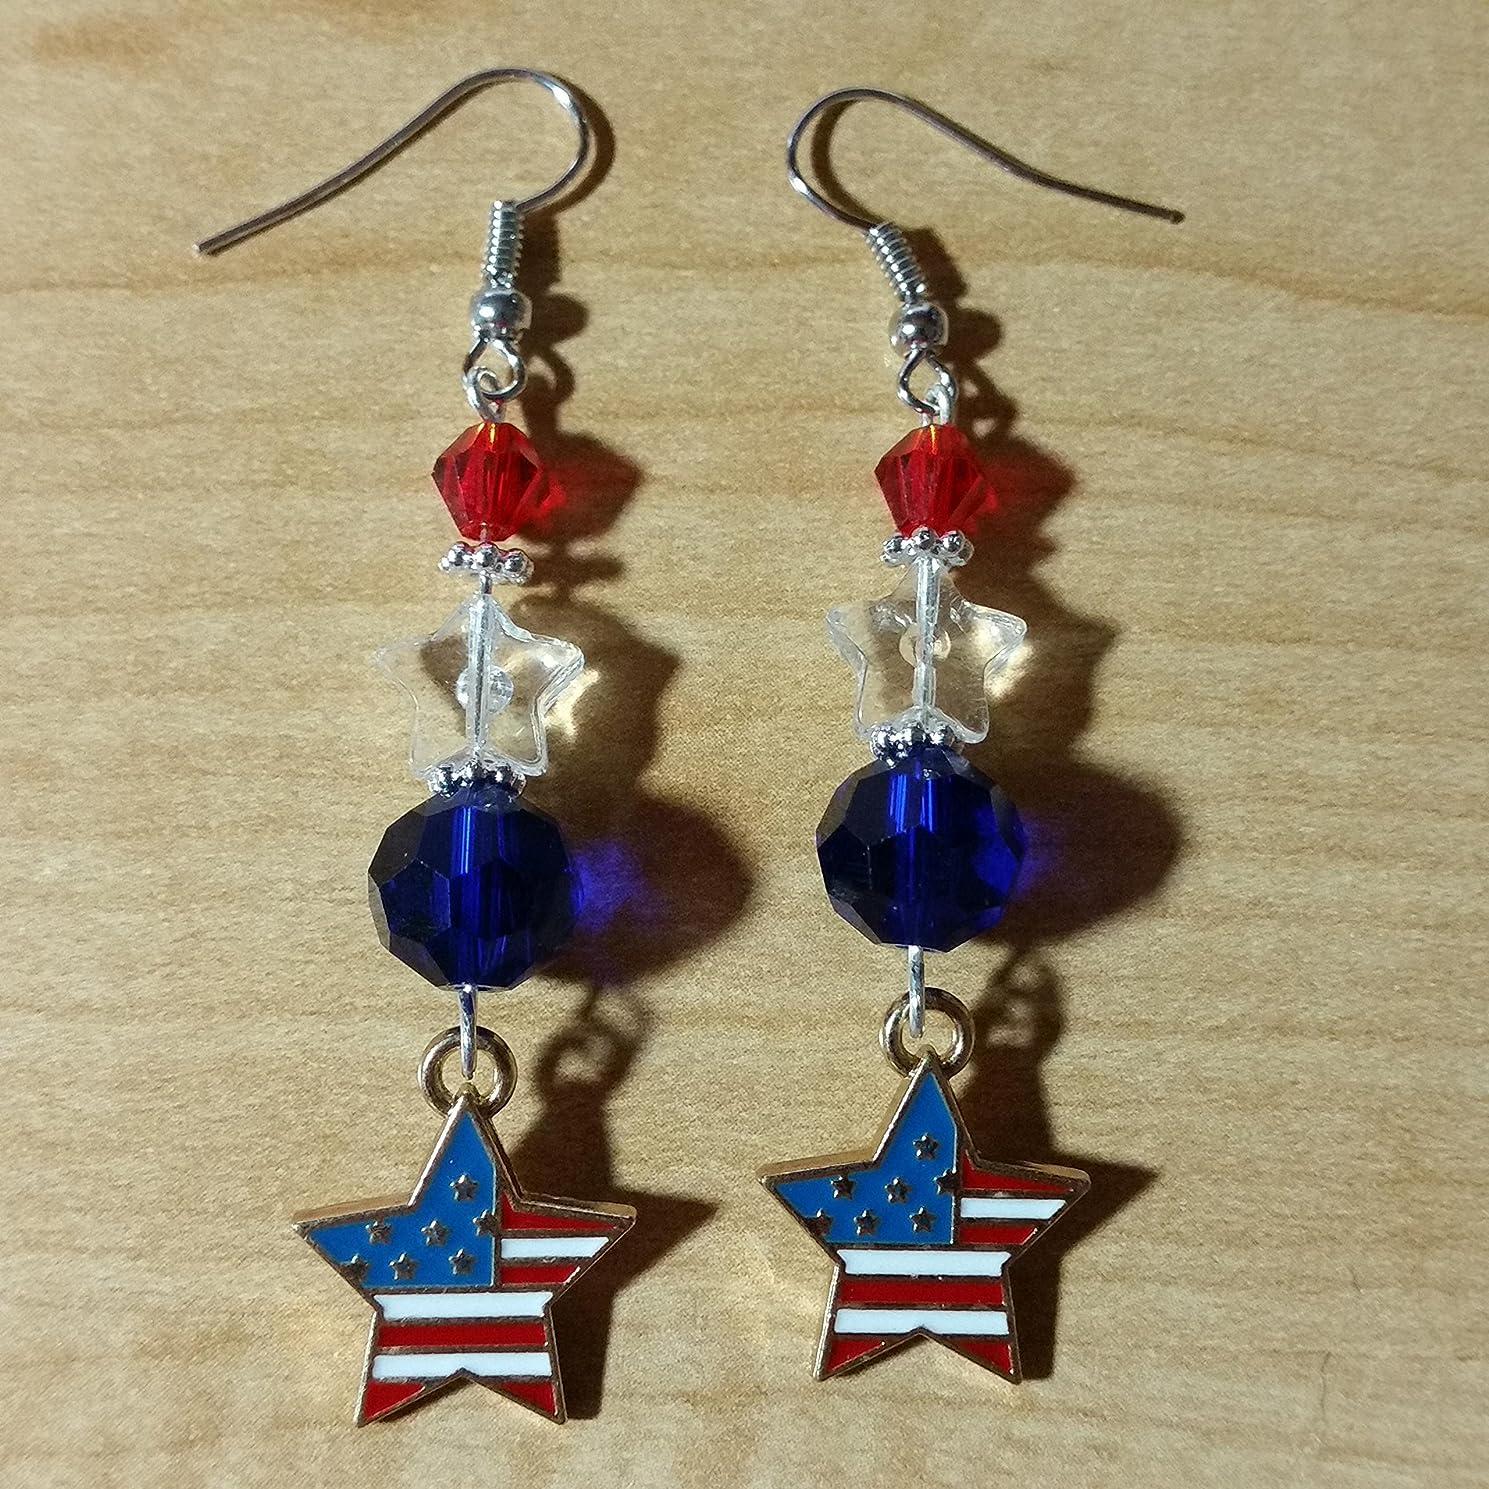 American Flag USA Patriotic Days Earrings - Handmade Beaded Dangle Drop Earrings